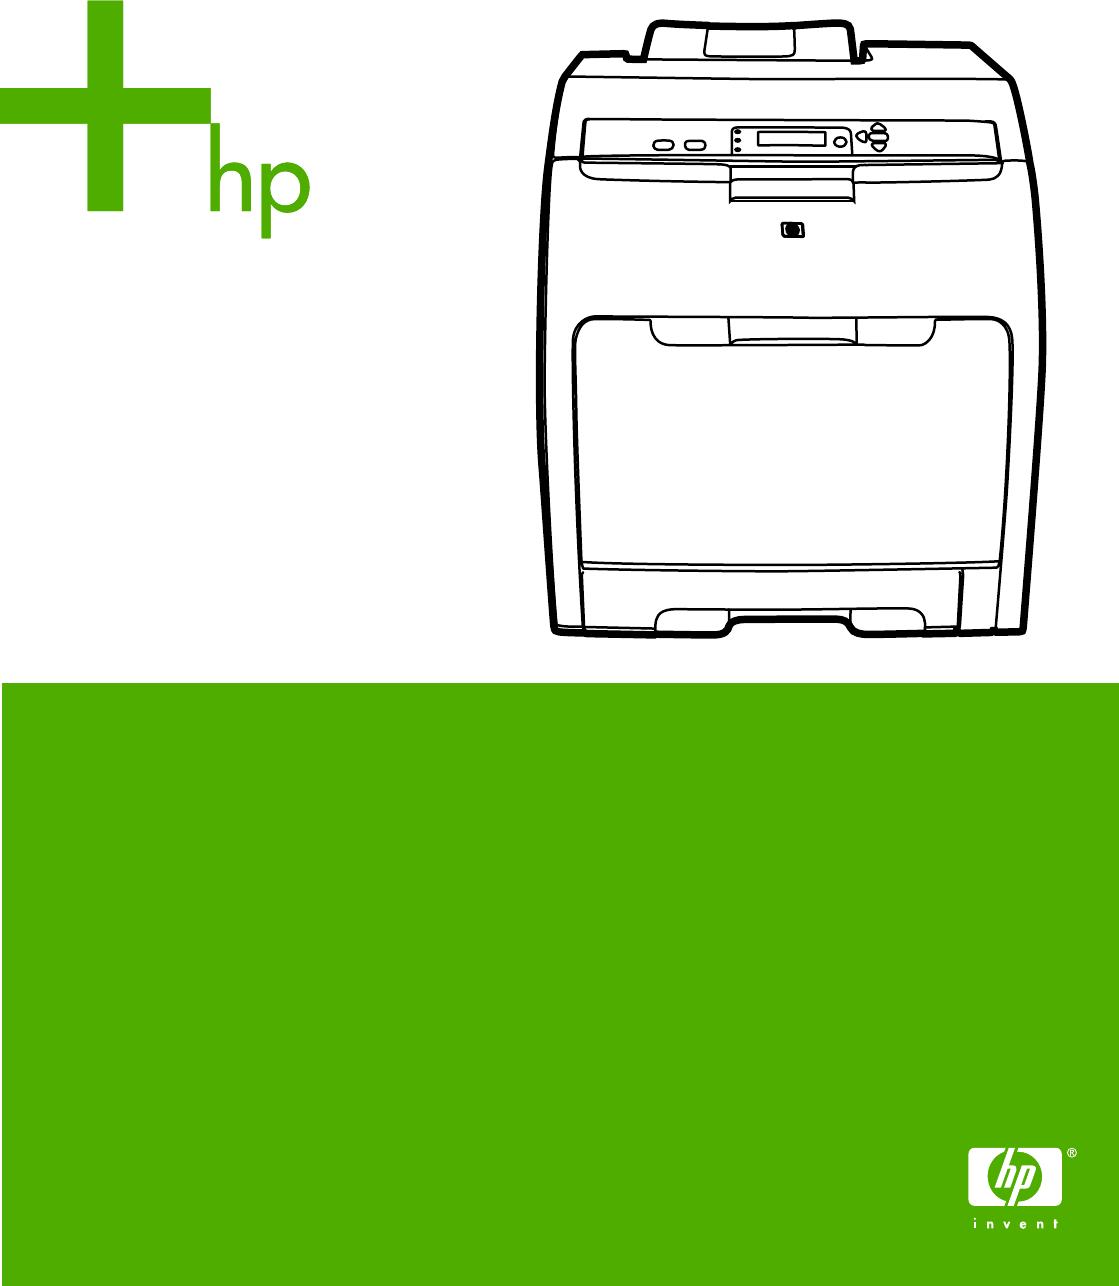 hp color laserjet 3000 3600 3800 series printers service manual rh dectrader com hp color laserjet 3600 service manual hp 3600 service manual free download